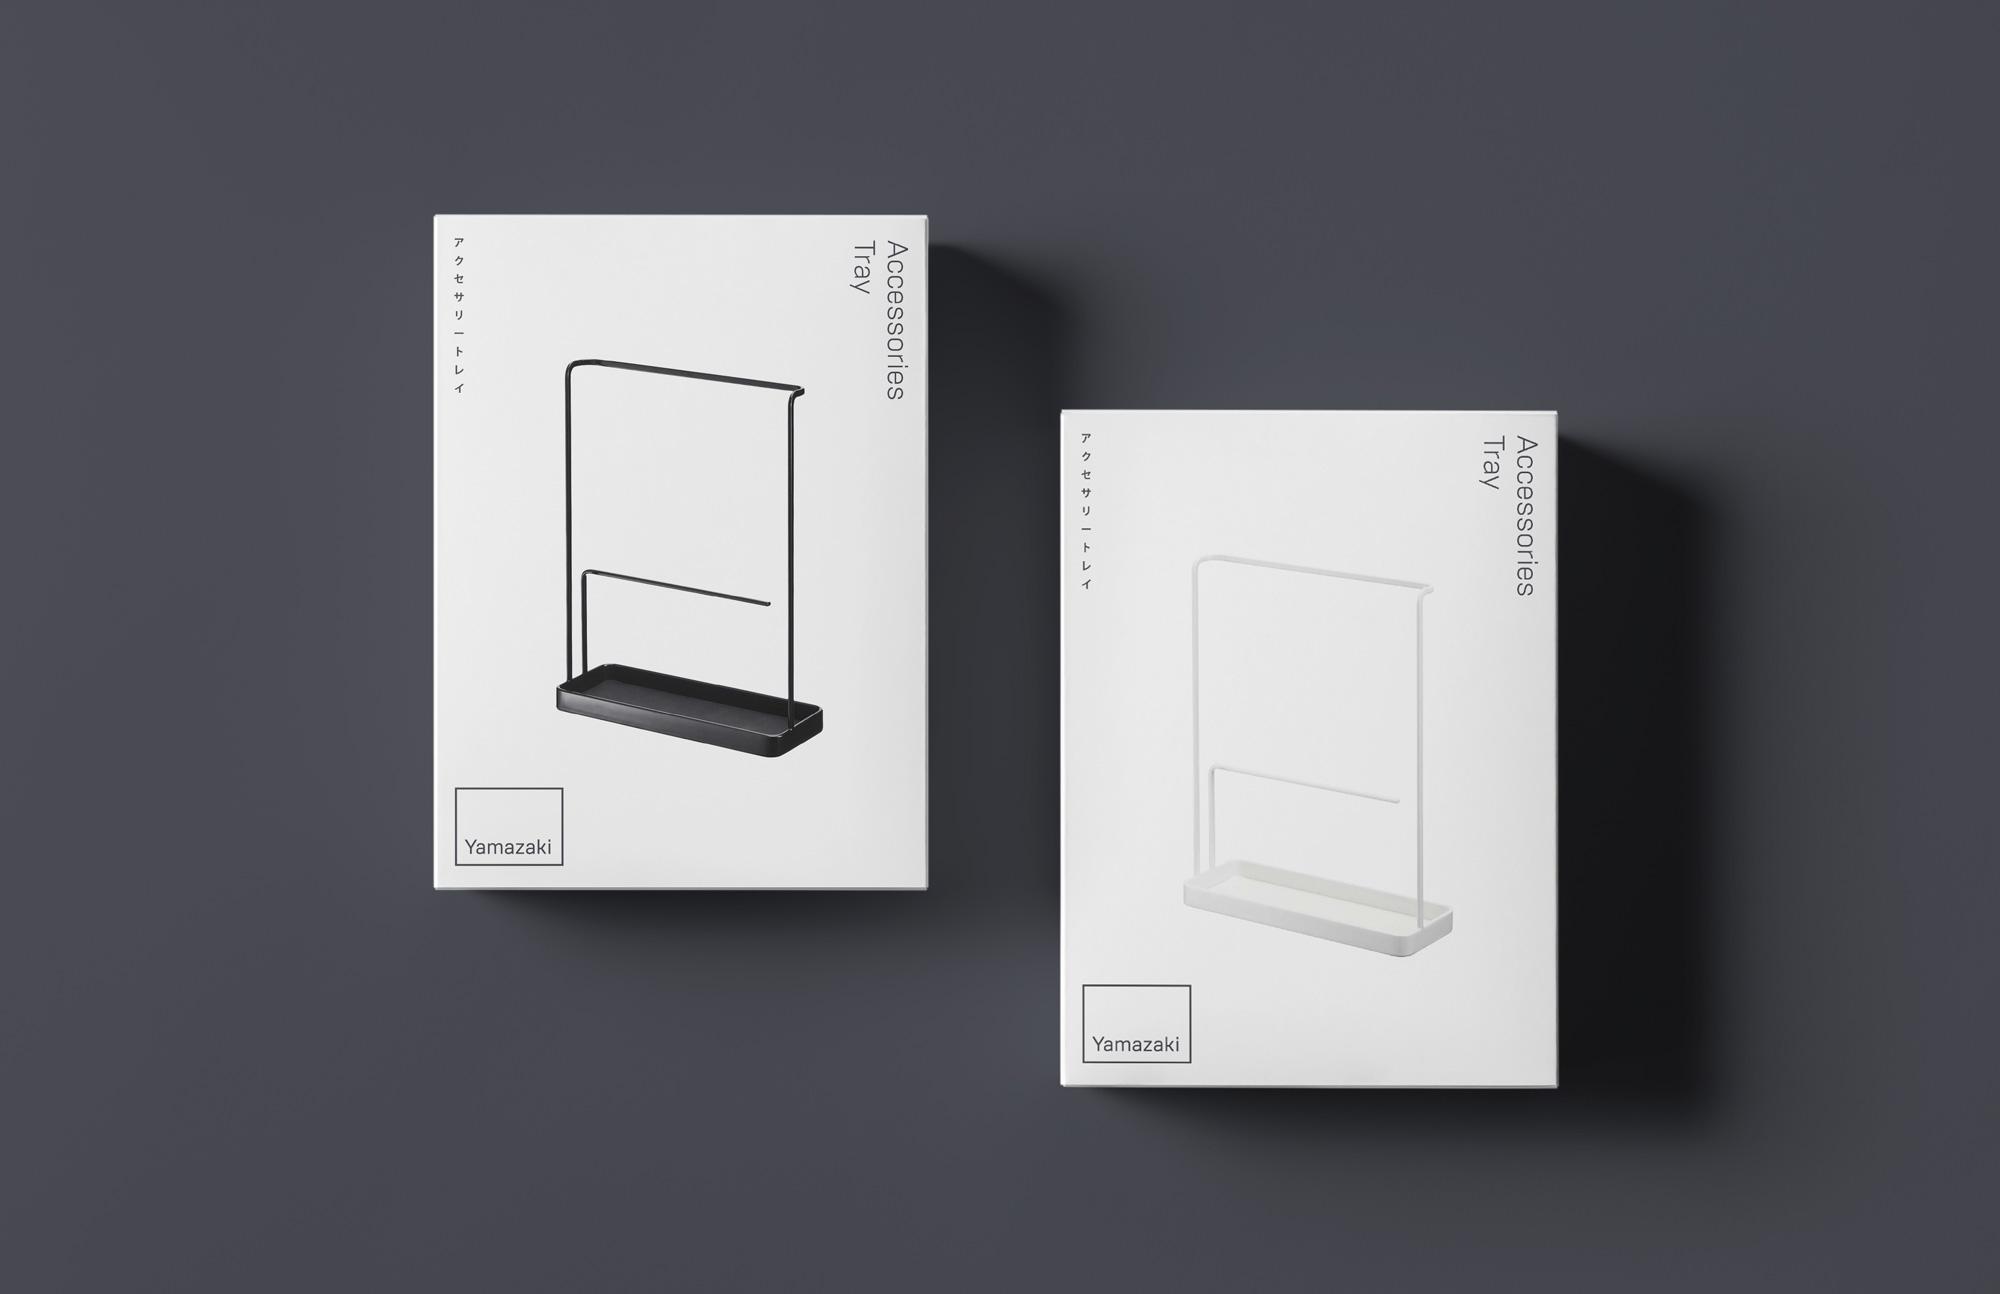 Yamazaki-Double-Box